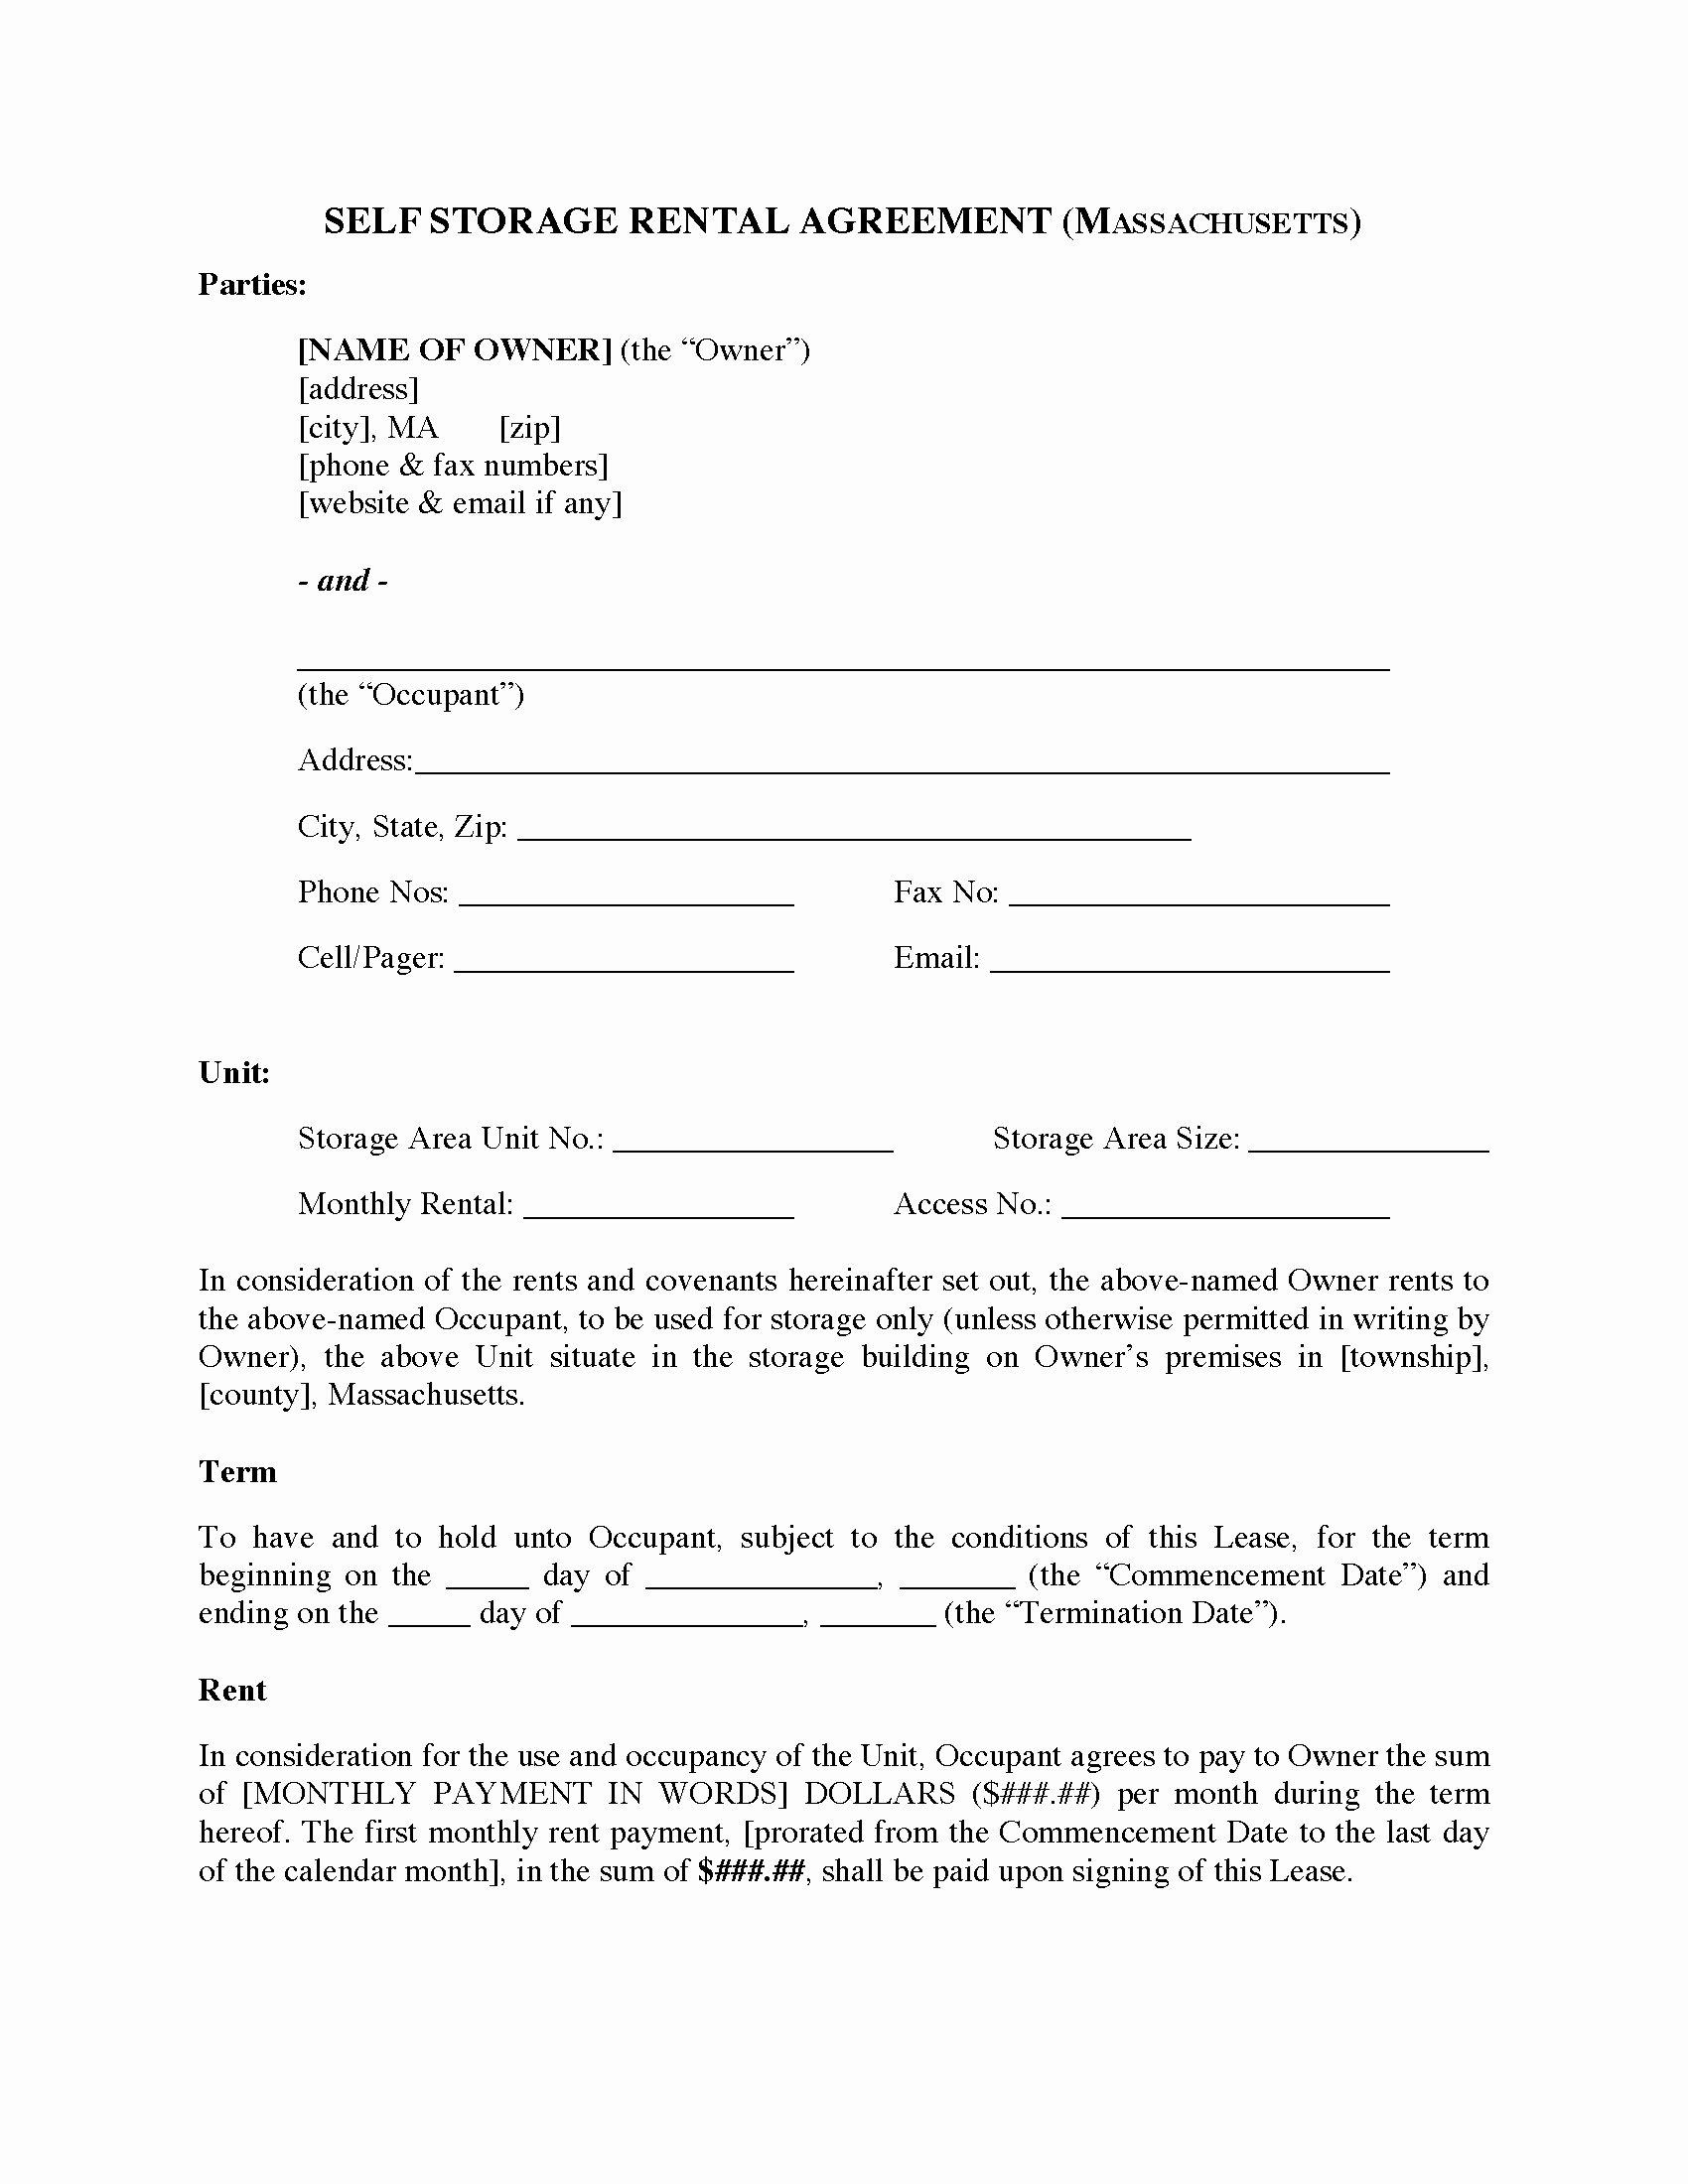 Vehicle Storage Contract Template Unique Massachusetts Self Storage Rental Agreement